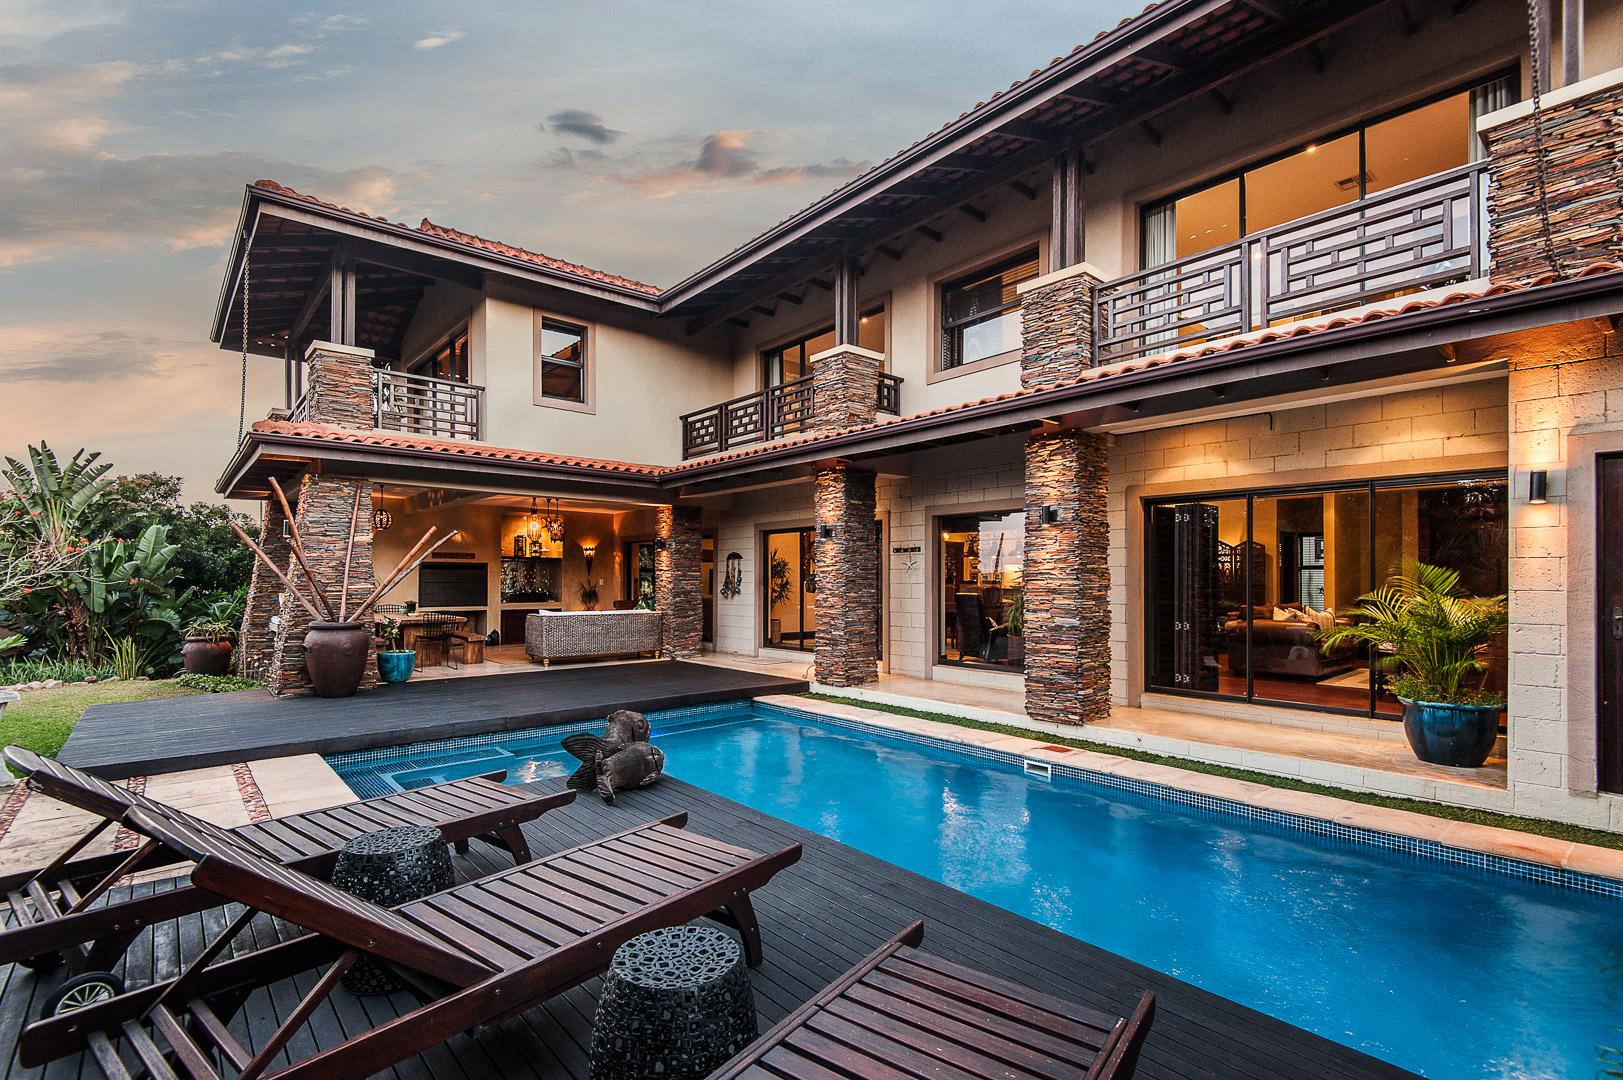 4 BedroomHouse For Sale In Zimbali Coastal Resort & Estate